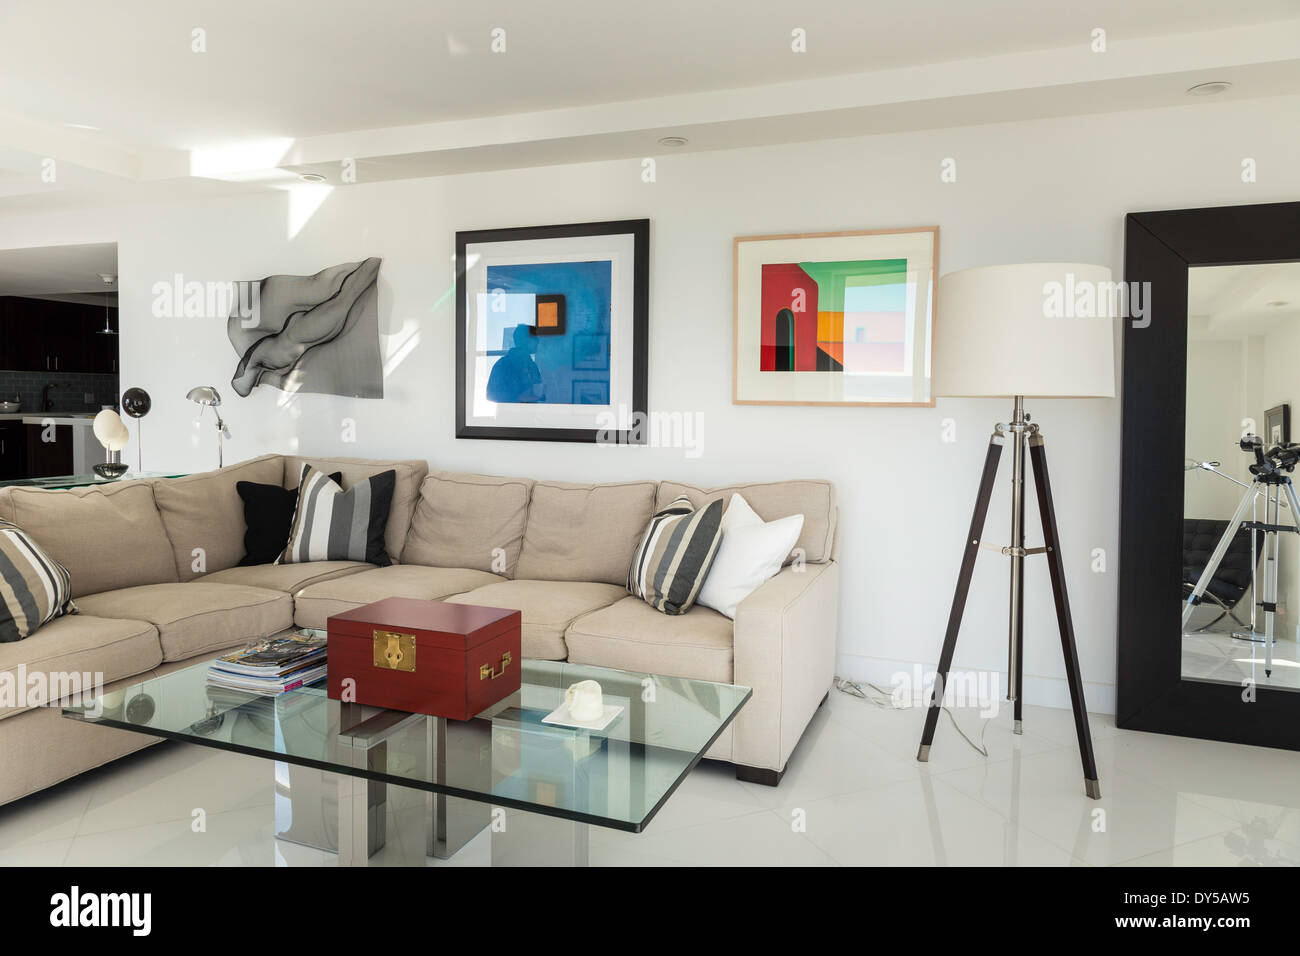 Dorable The Living Room Fort Lauderdale Frieze - Living Room Design ...